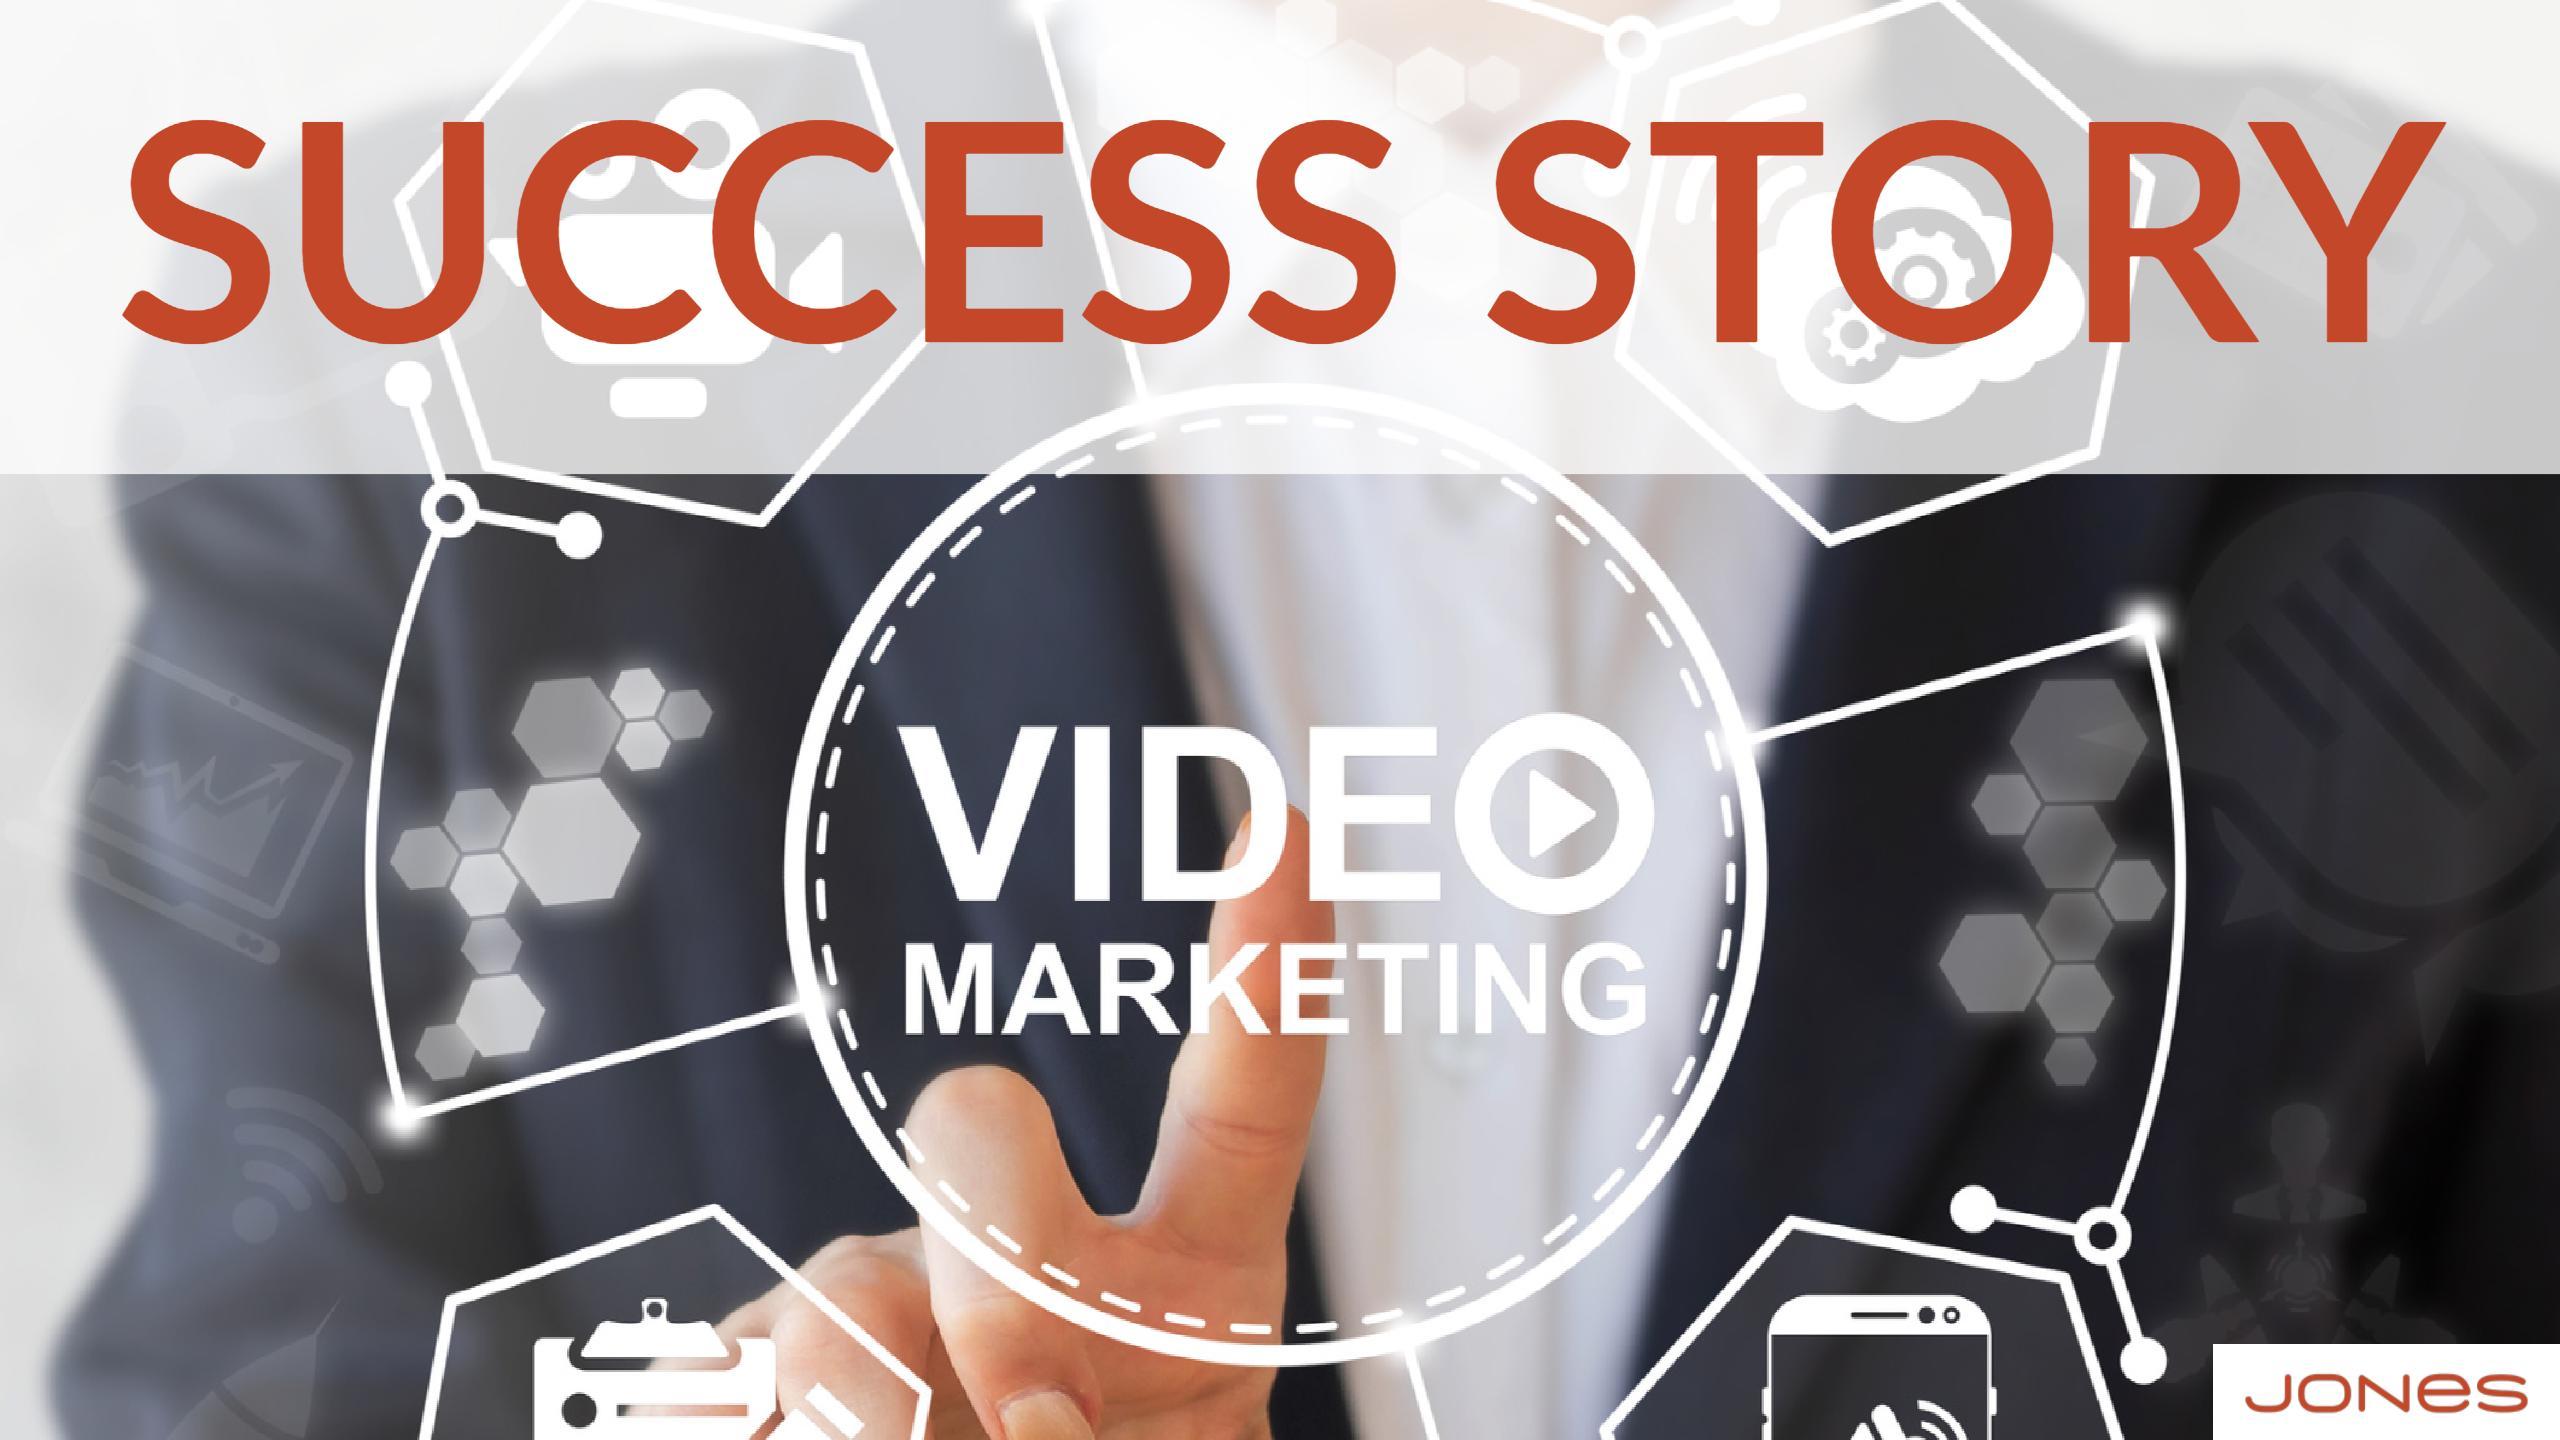 video marketing success story